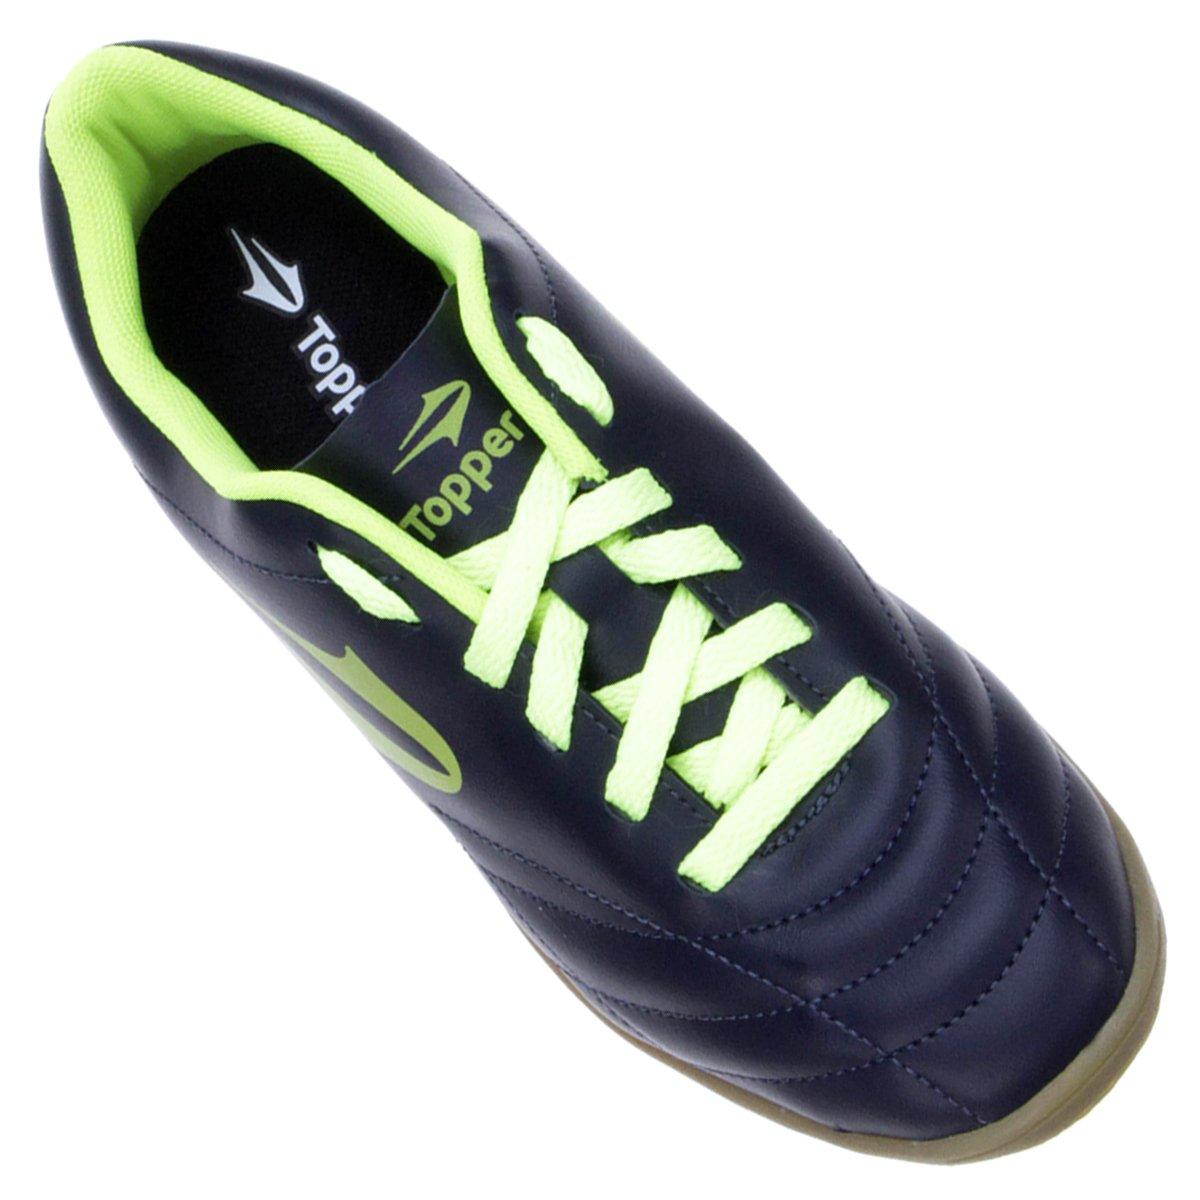 Chuteira Futsal Topper Slick 2 Masculina - Compre Agora  d82f3fc25e1c8